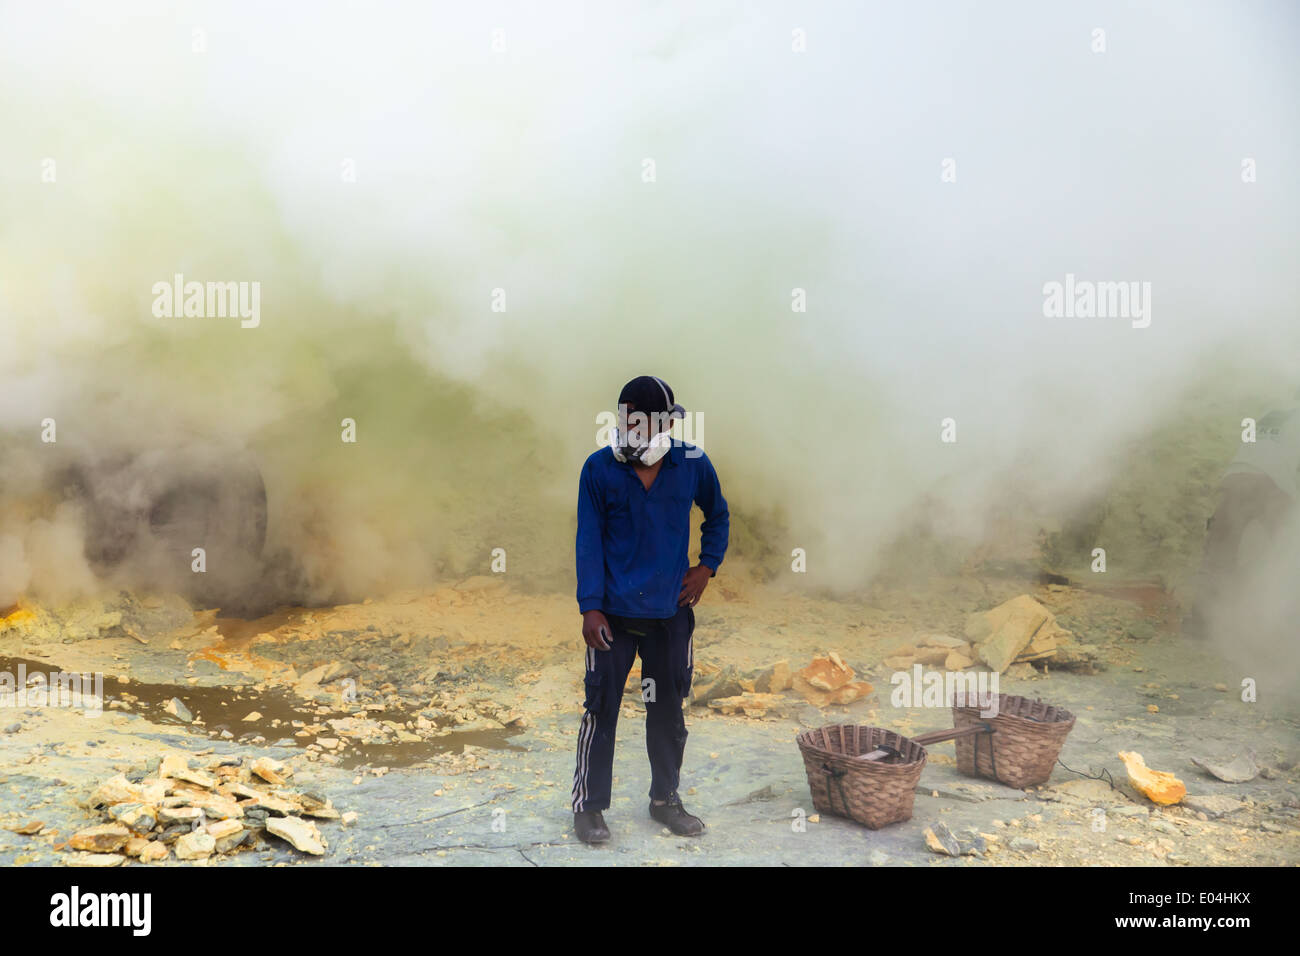 Sulfur miner wearing gas mask, Kawah Ijen, Banyuwangi Regency, East Java, Indonesia - Stock Image